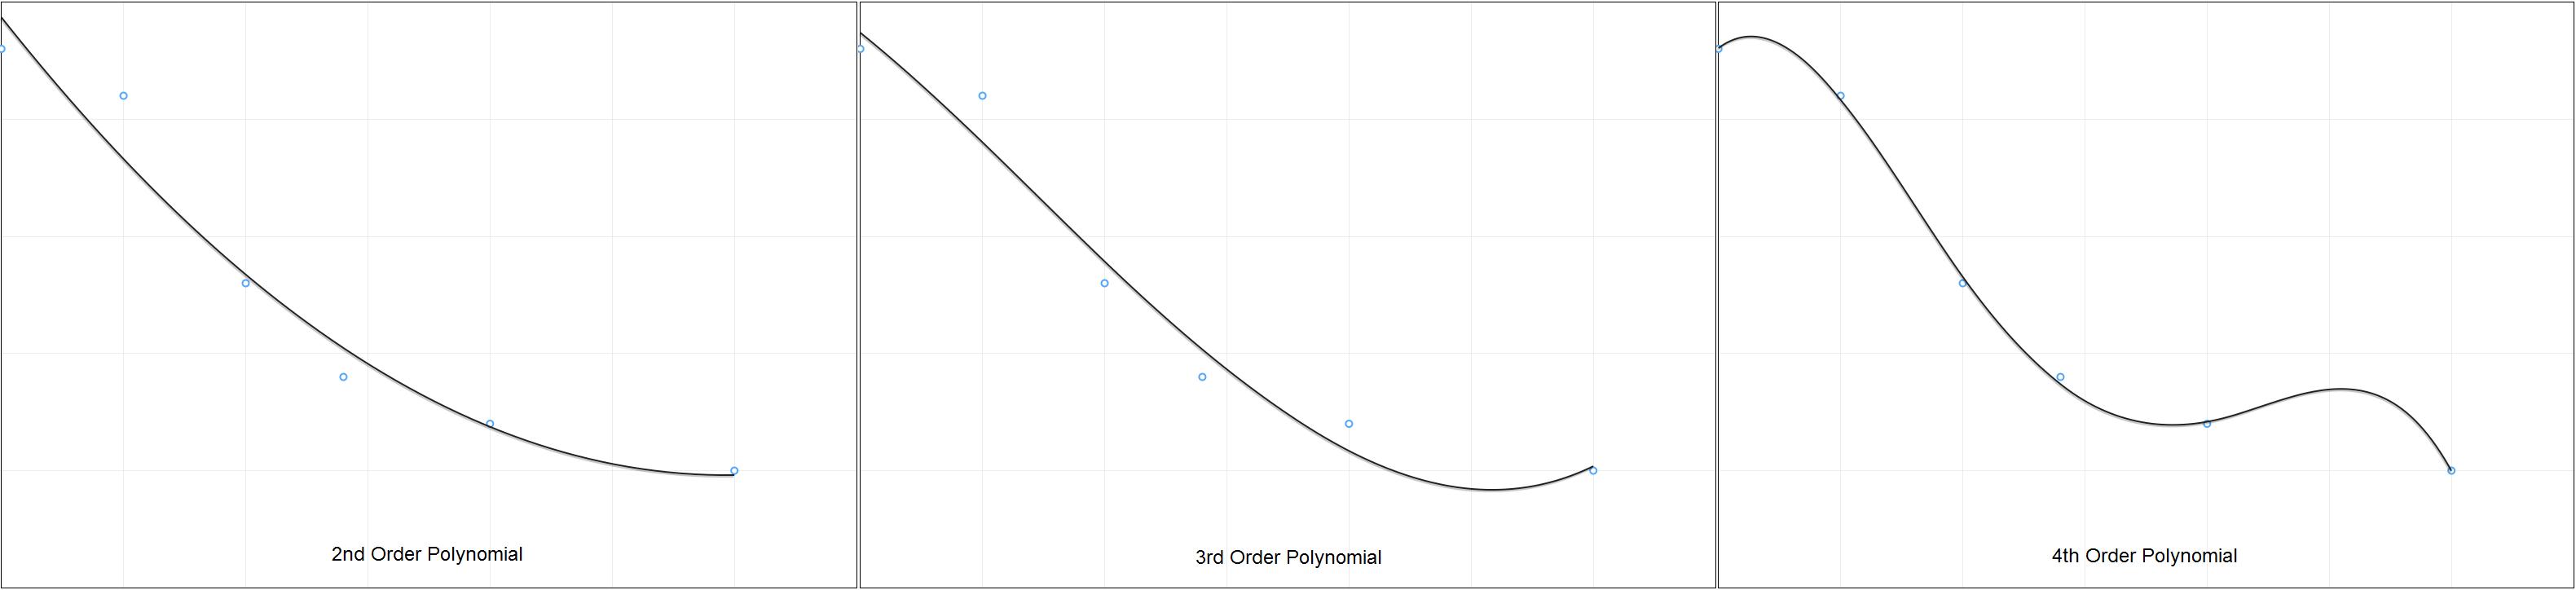 Polynomial Wiggle